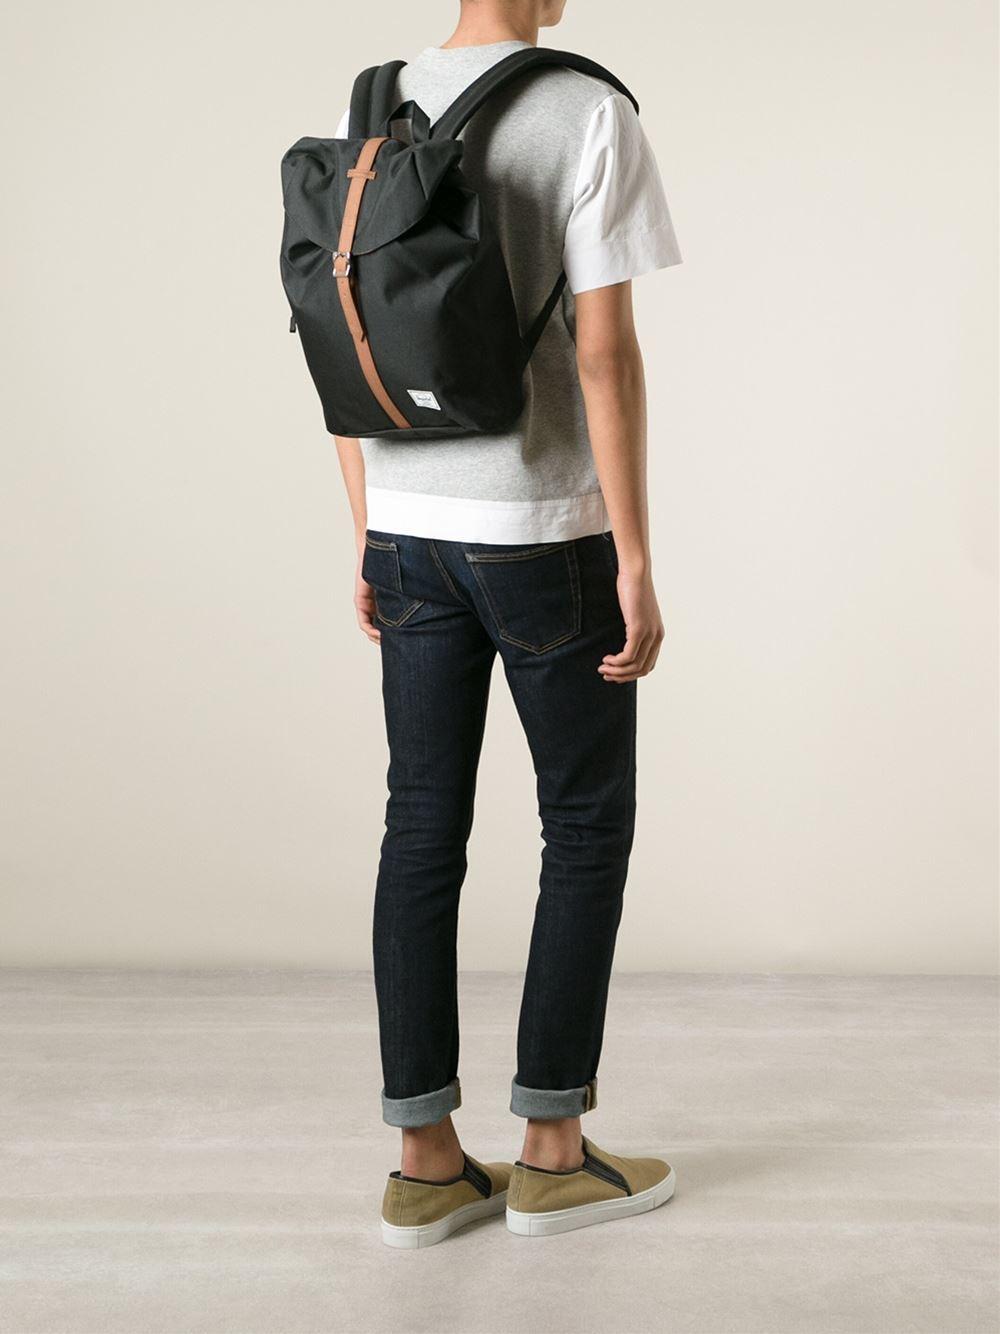 cb400777b6c Lyst - Herschel Supply Co.  Post  Backpack in Black for Men